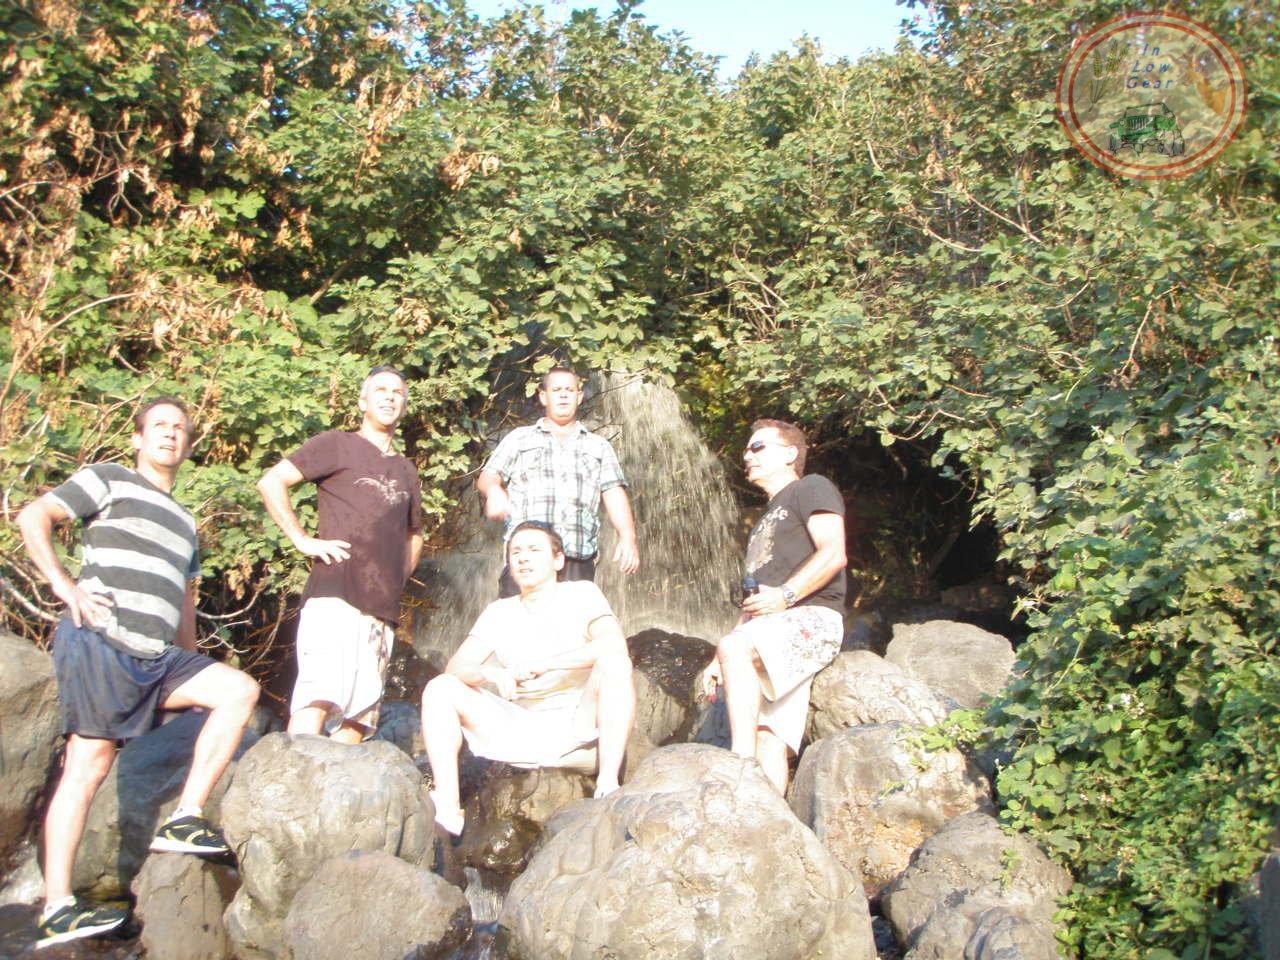 jeep tours Golan: Ein Tina waterfall. טיולי ג'יפים בגולן, מפל עין תינה